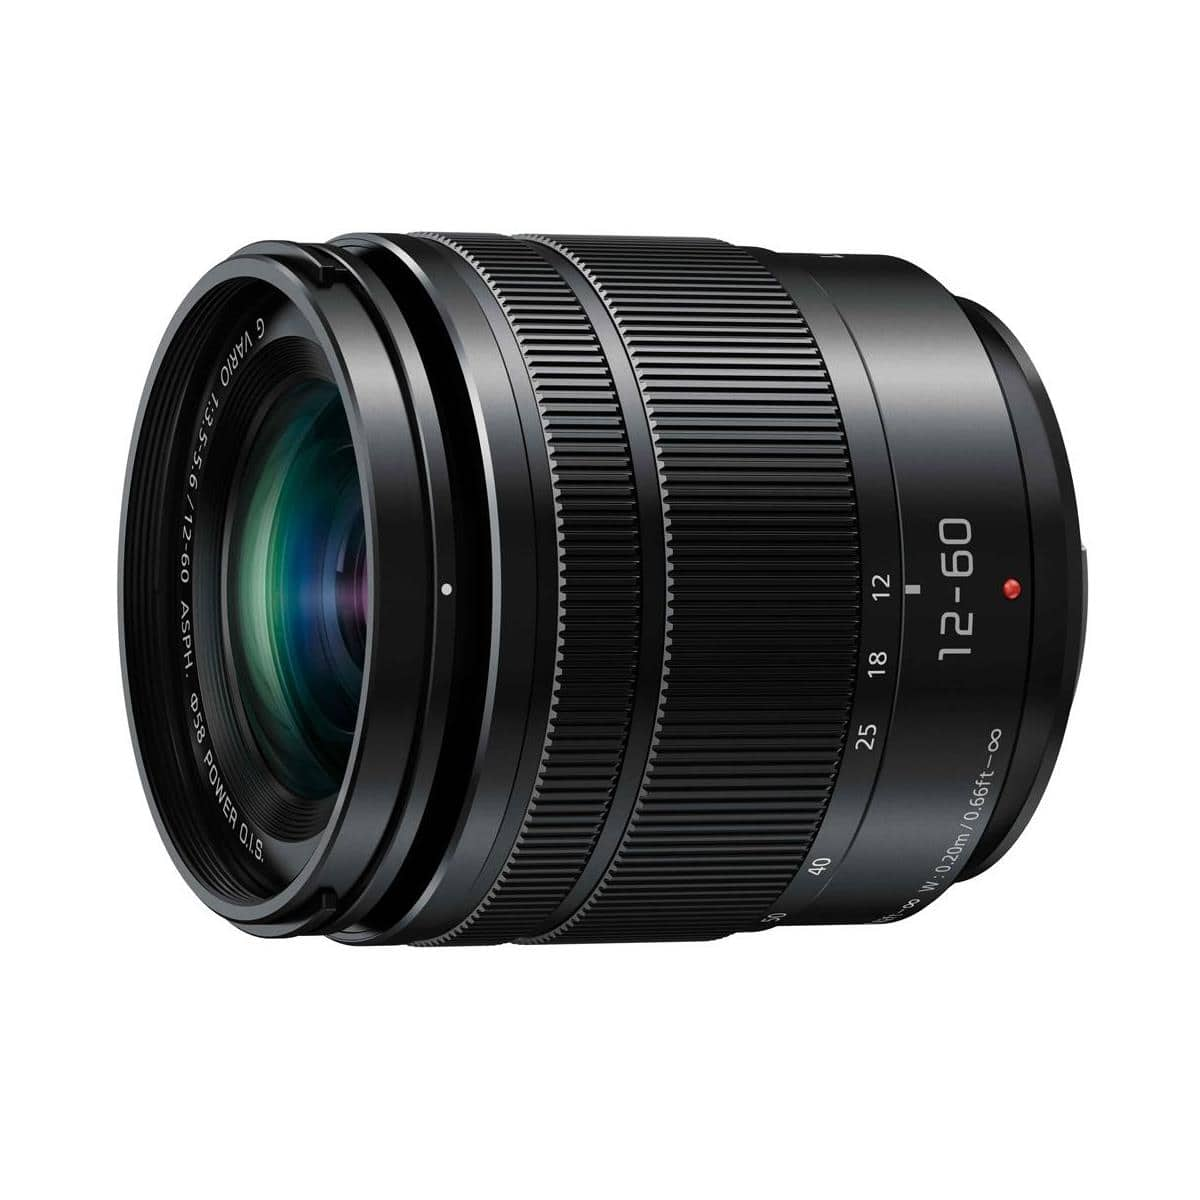 Panasonic G Vario 12-60mm F/3.5-5.6 O.I.S. Lens + $300 Adorama Gift Card $498 + free s/h